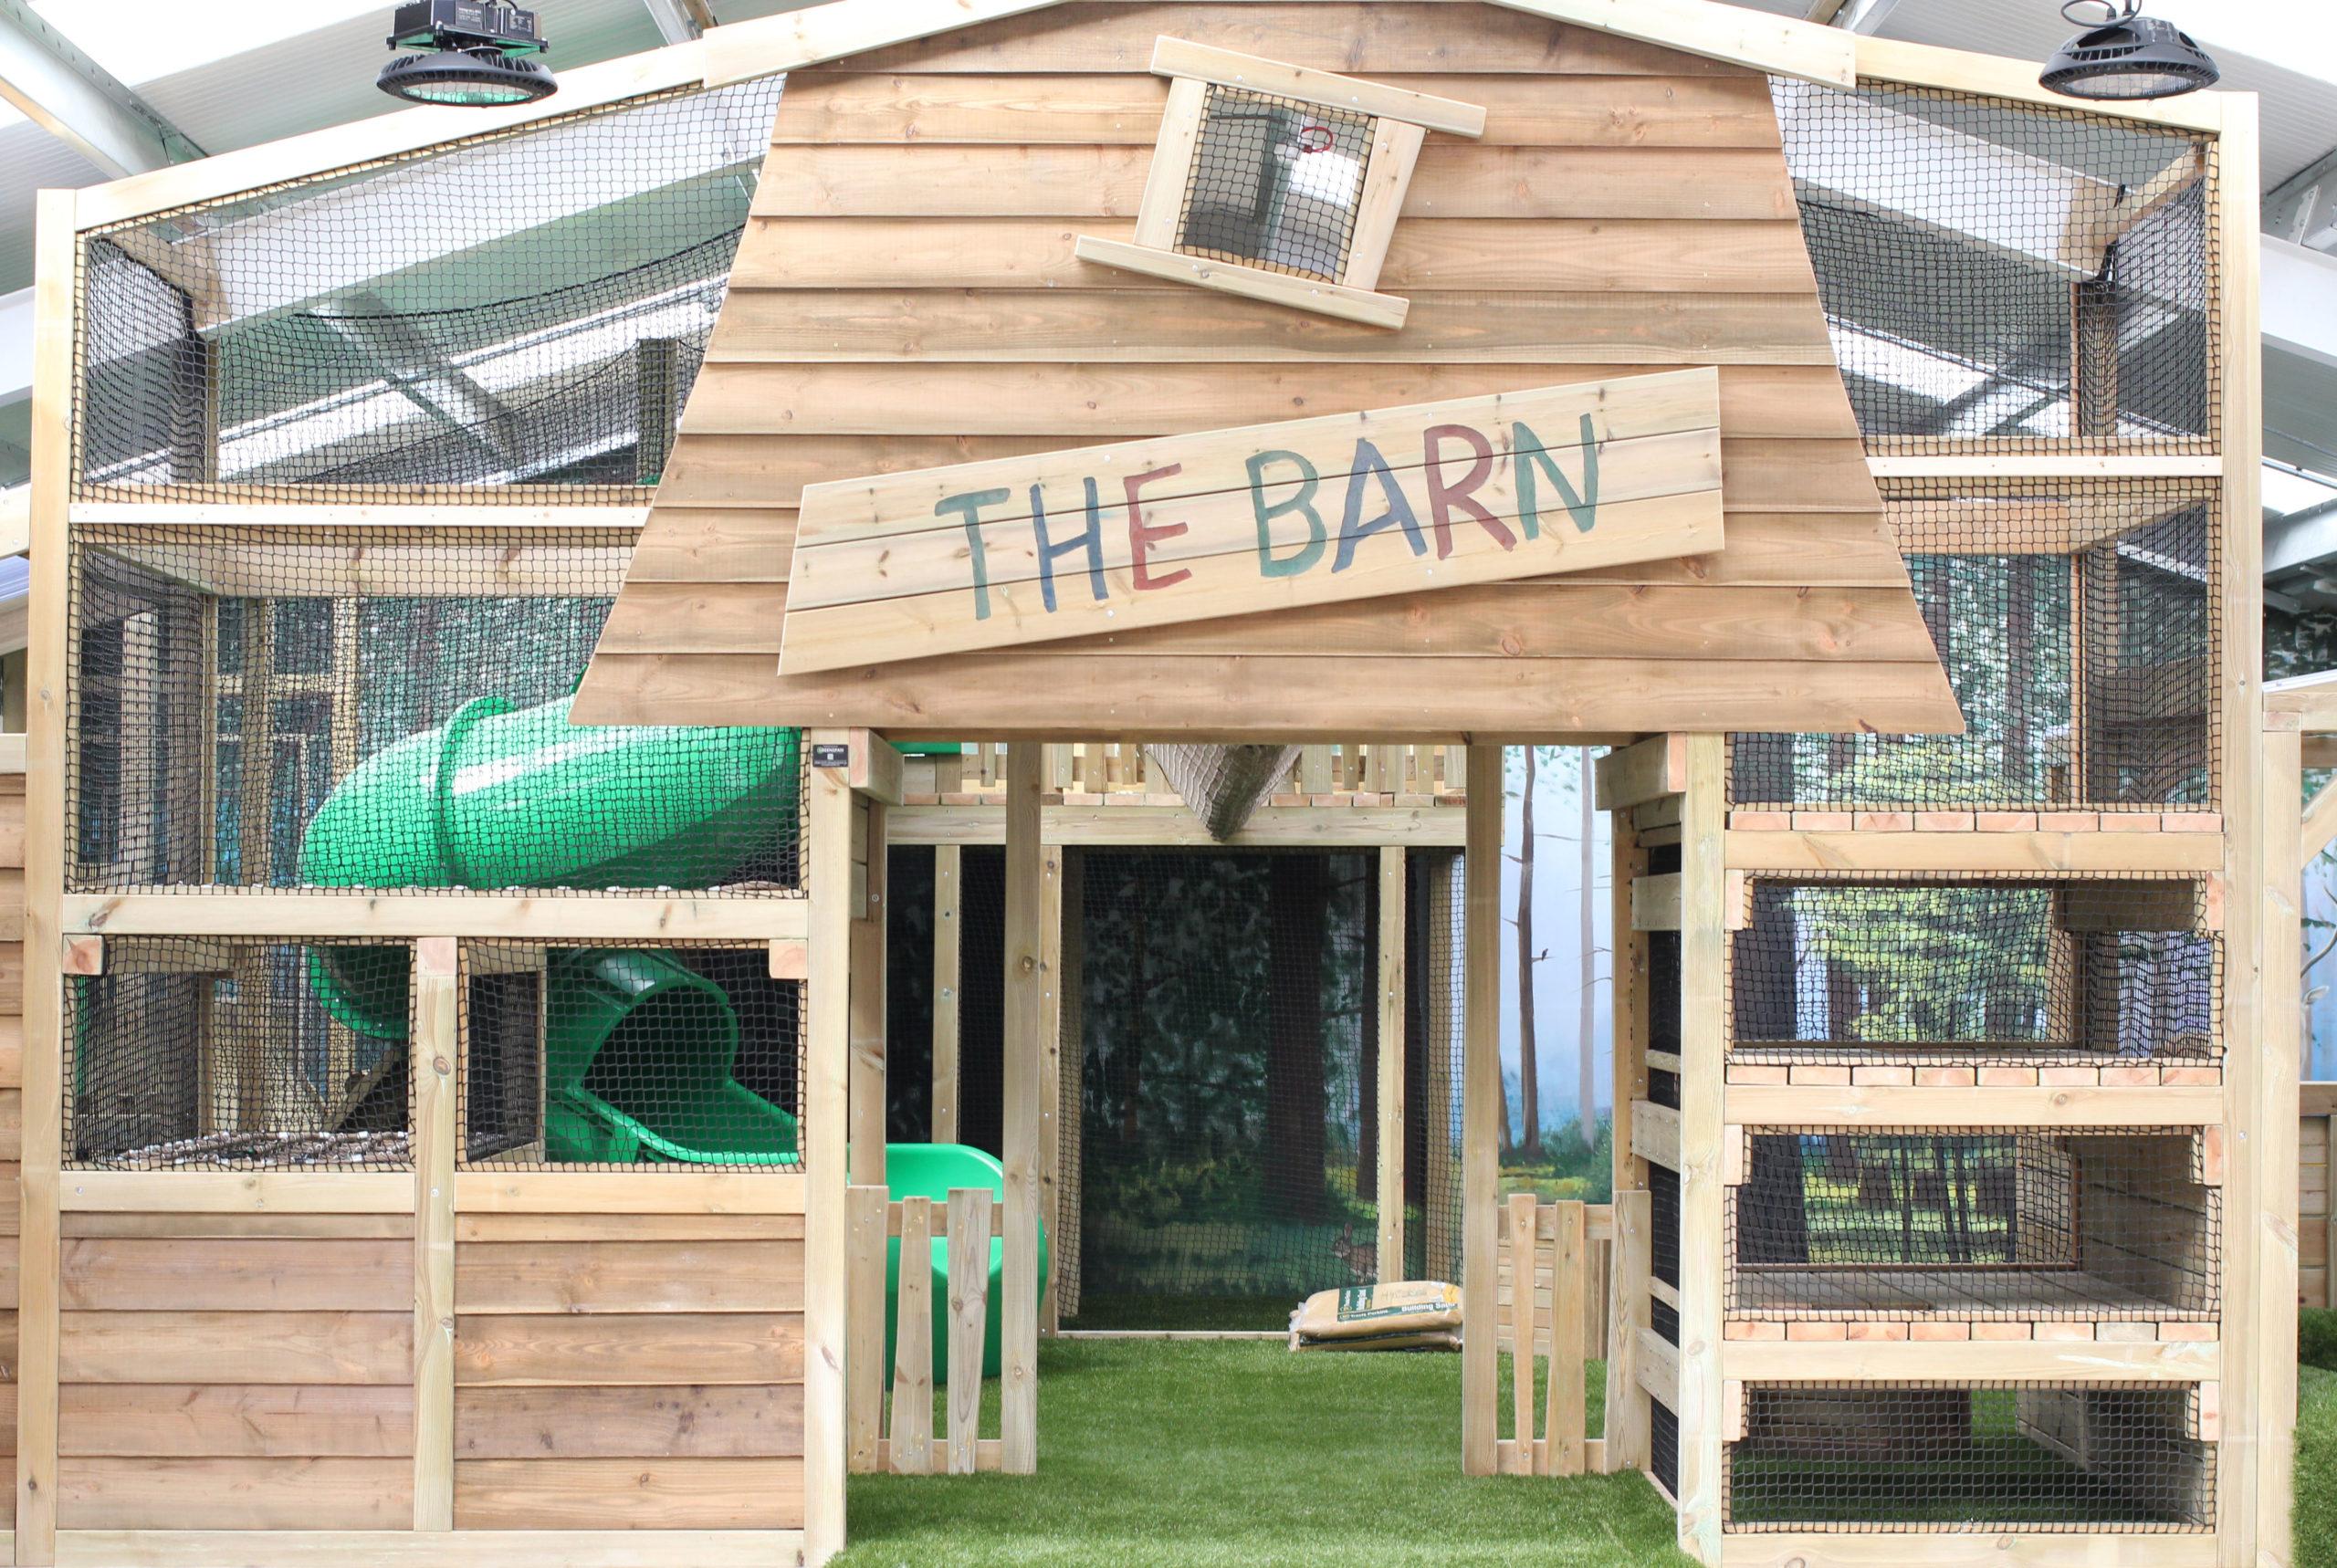 Interior of Play Barn